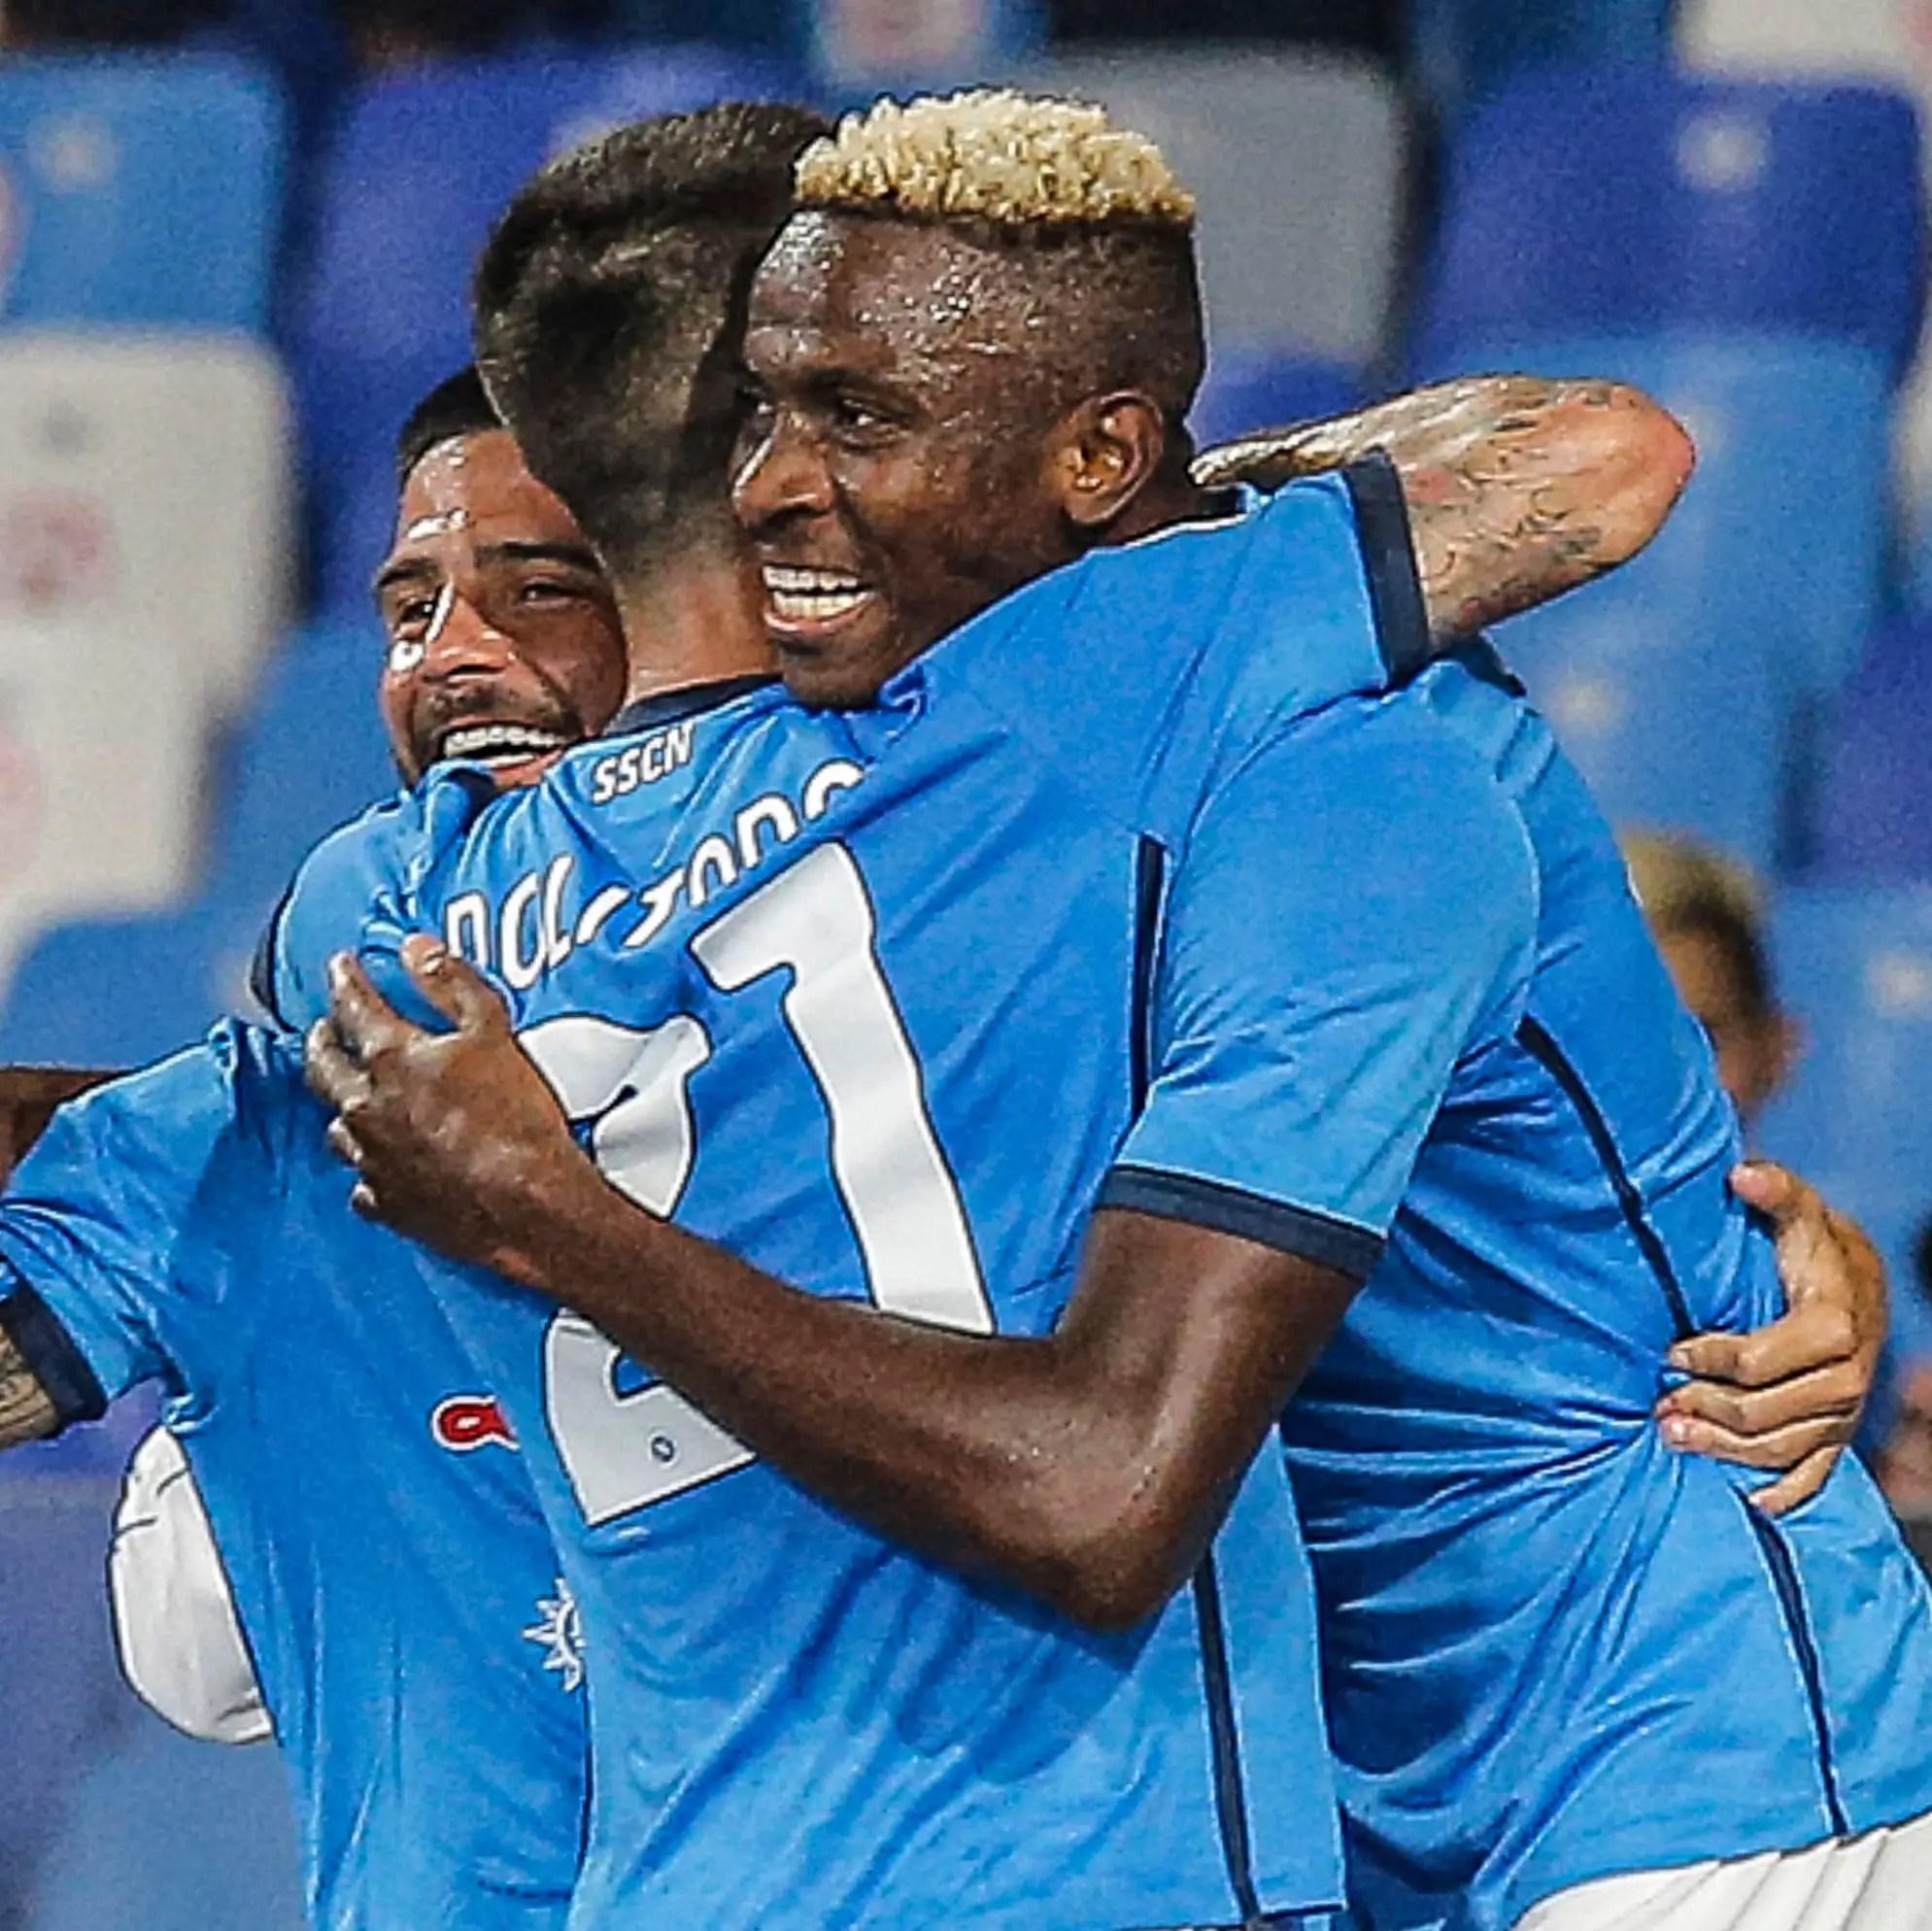 Serie A: Osimhen Bags 4th League Goal As Napoli Beat Cagliari To Reclaim Top Spot